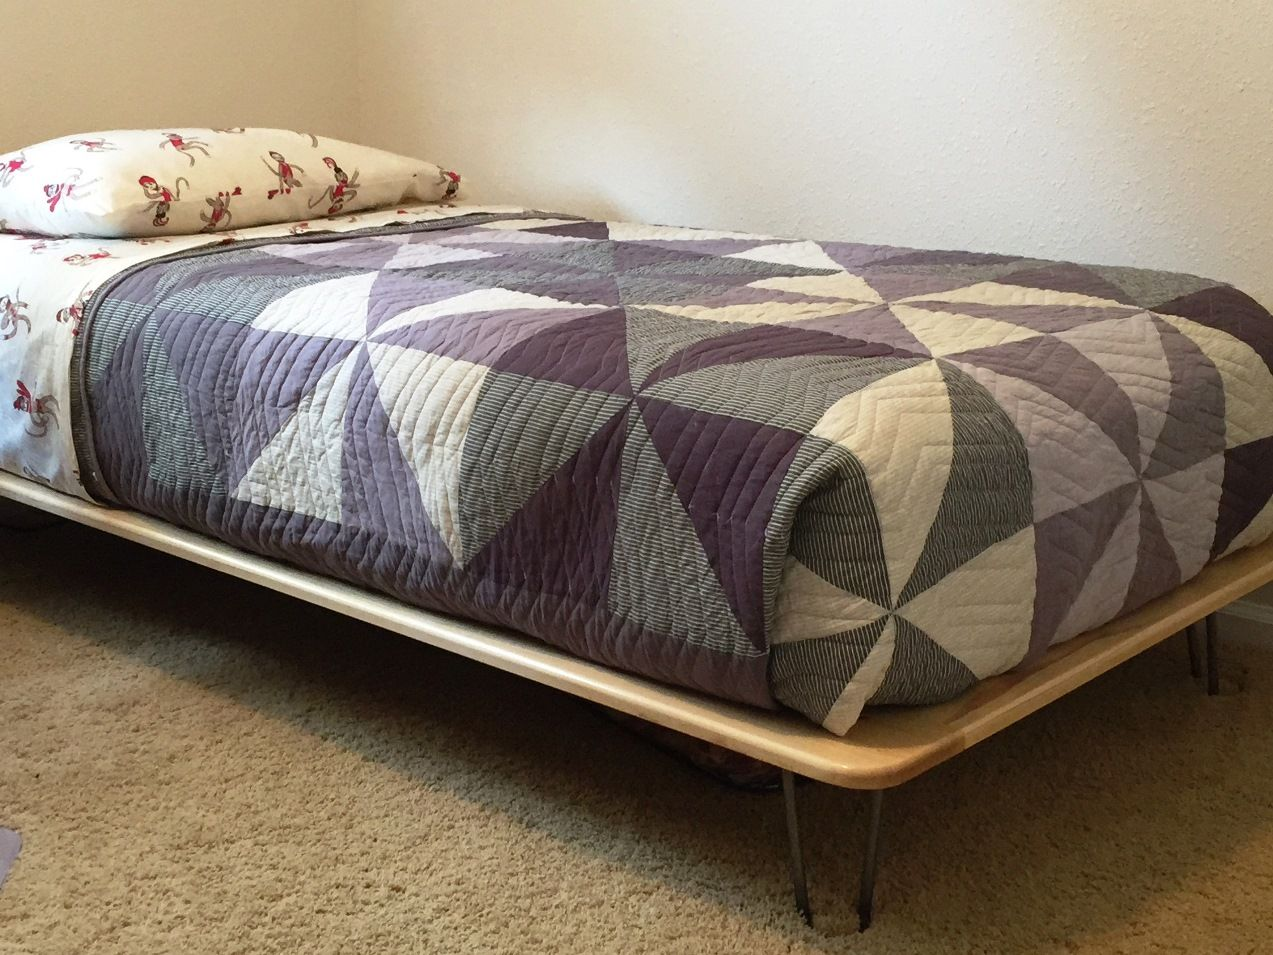 Nina S Custom Built Bed With Hairpin Legs Diy Platform Bed Plans Platform Bed Plans Diy Platform Bed